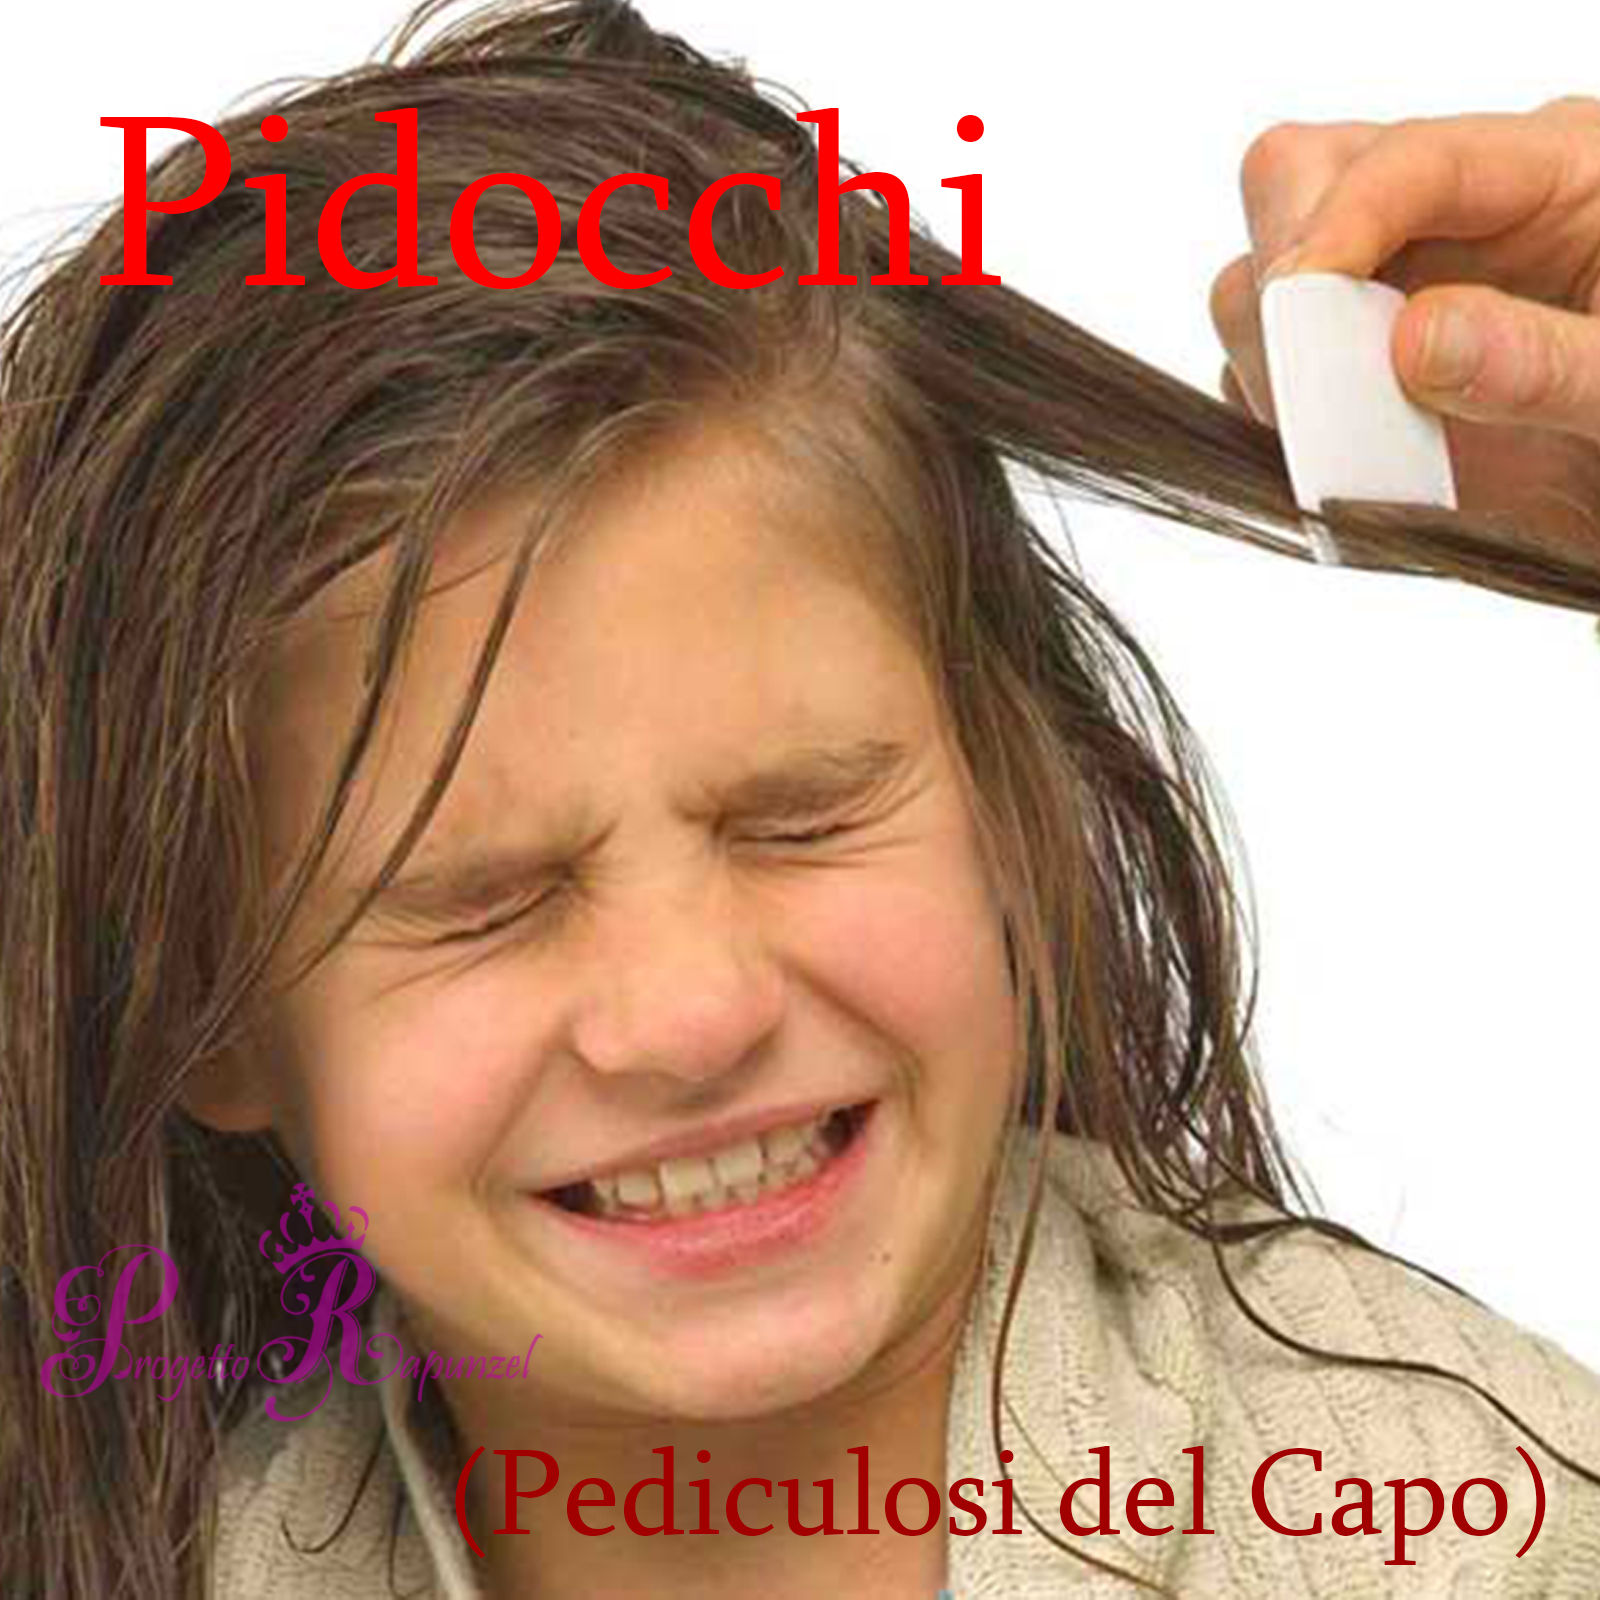 Pidocchi (Pediculosi del capo)